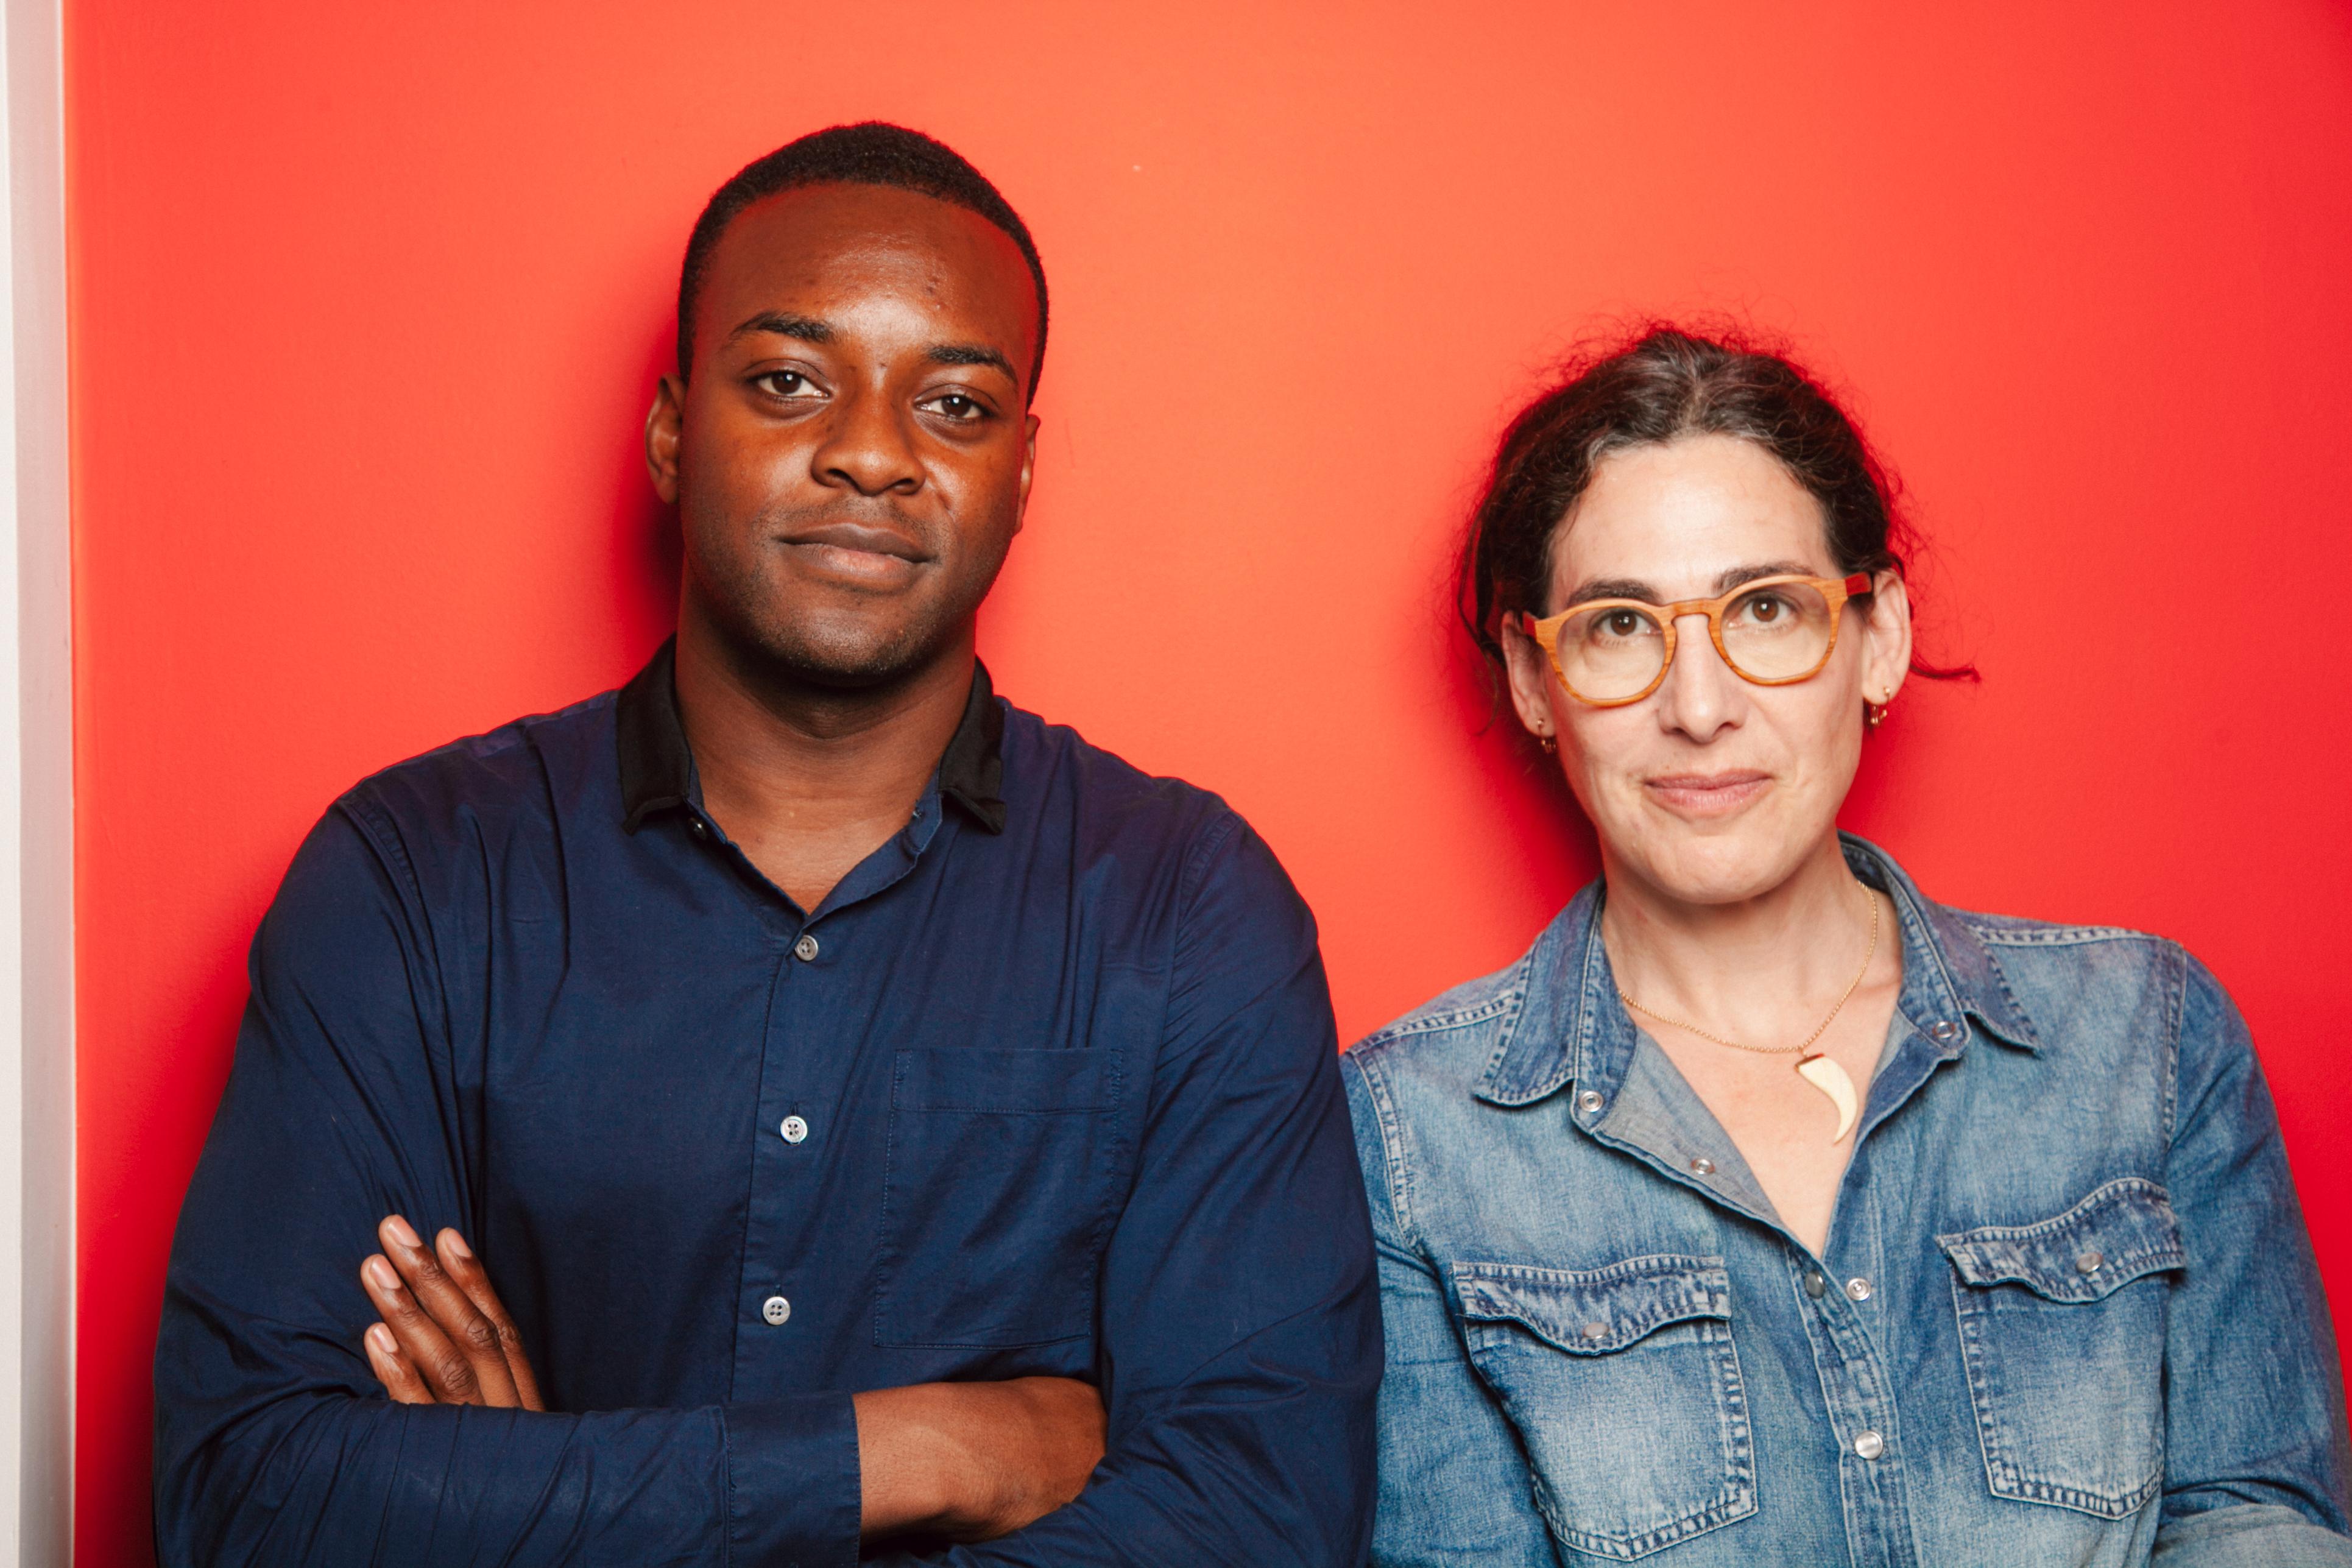 Serial Emmanuel Dzotsi and Sarah Koenig